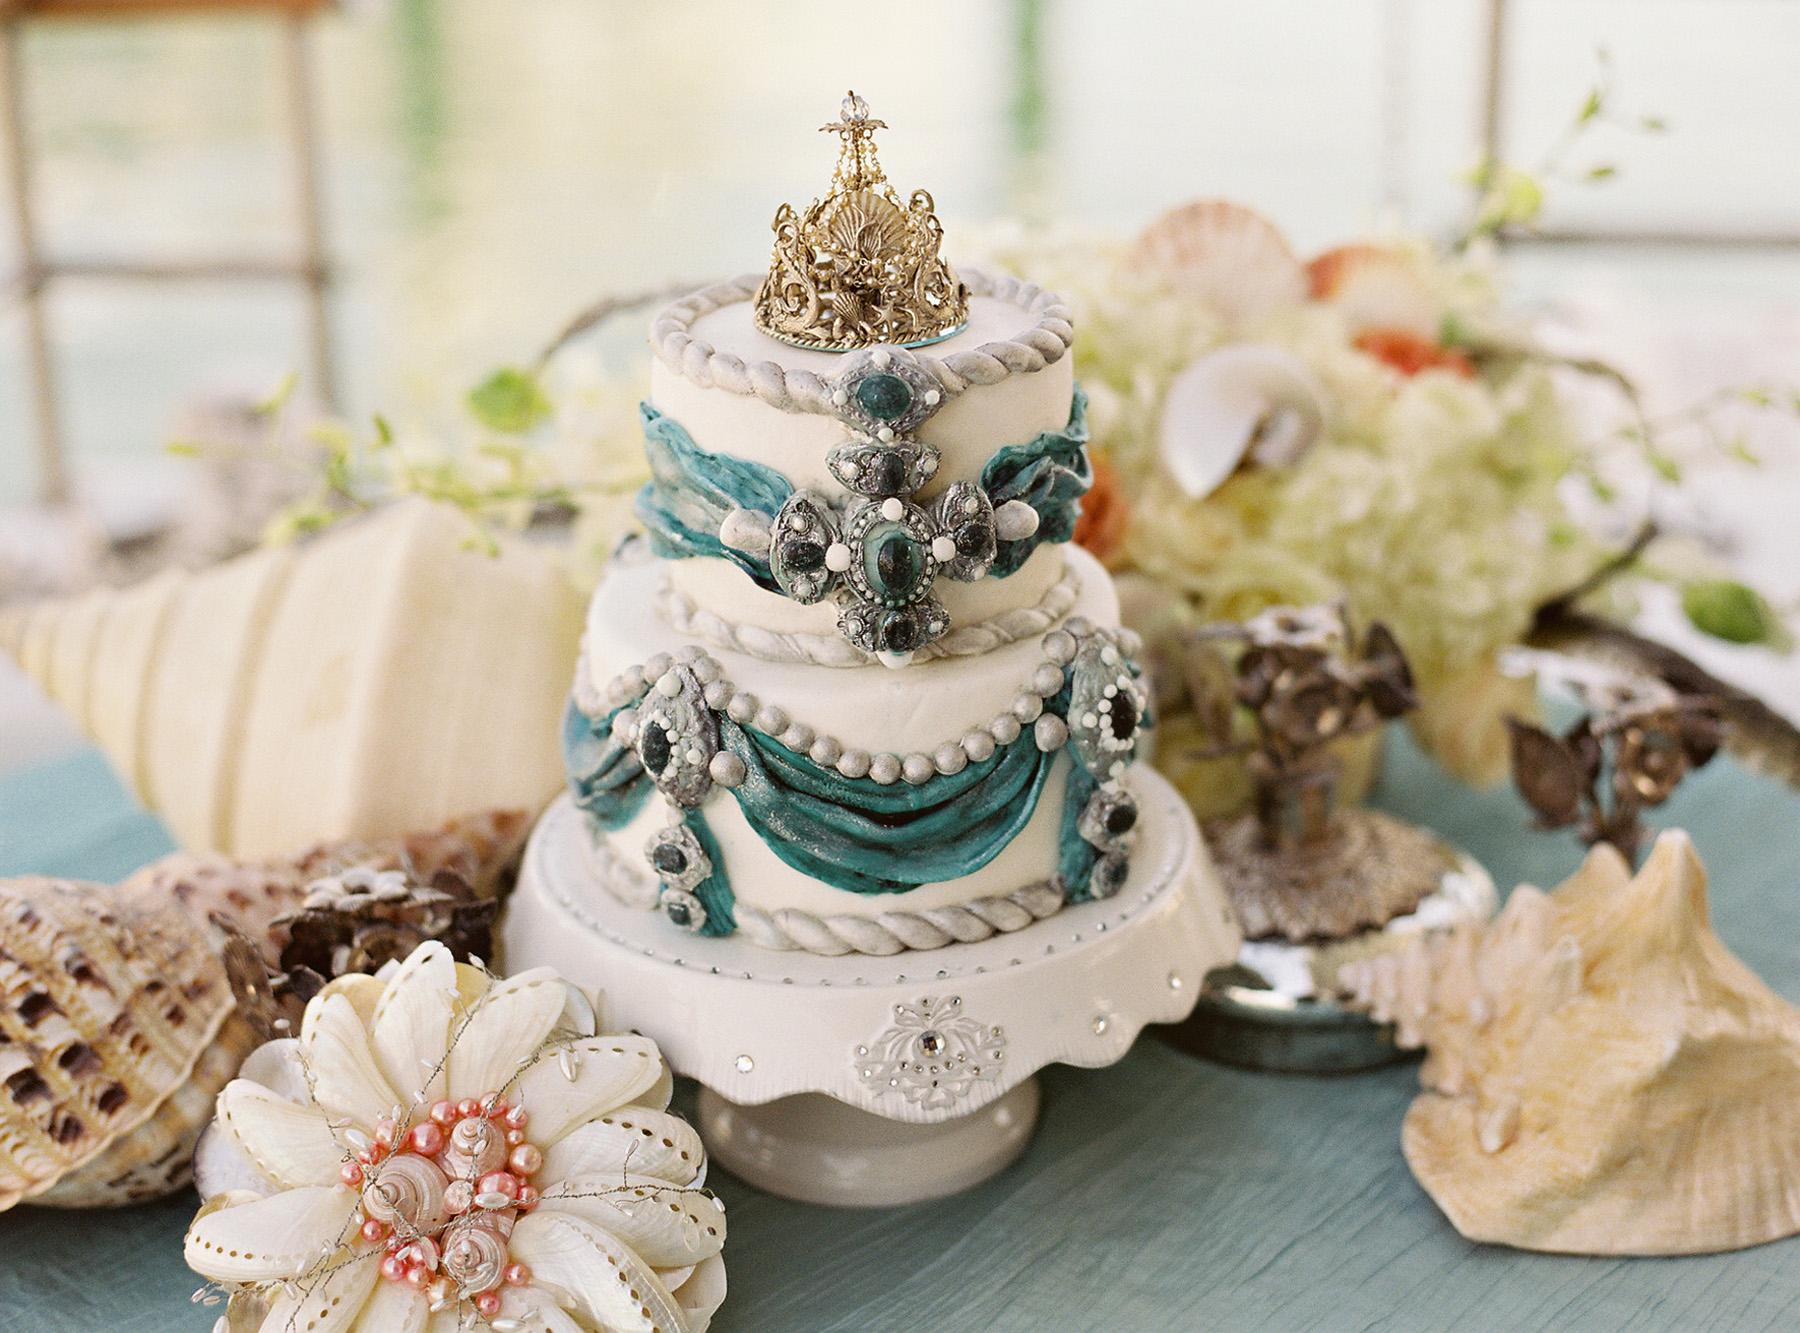 alegria-by-design-wedding-coordinator-planner-santa-barbara-channel-cat-yacht (6).jpg